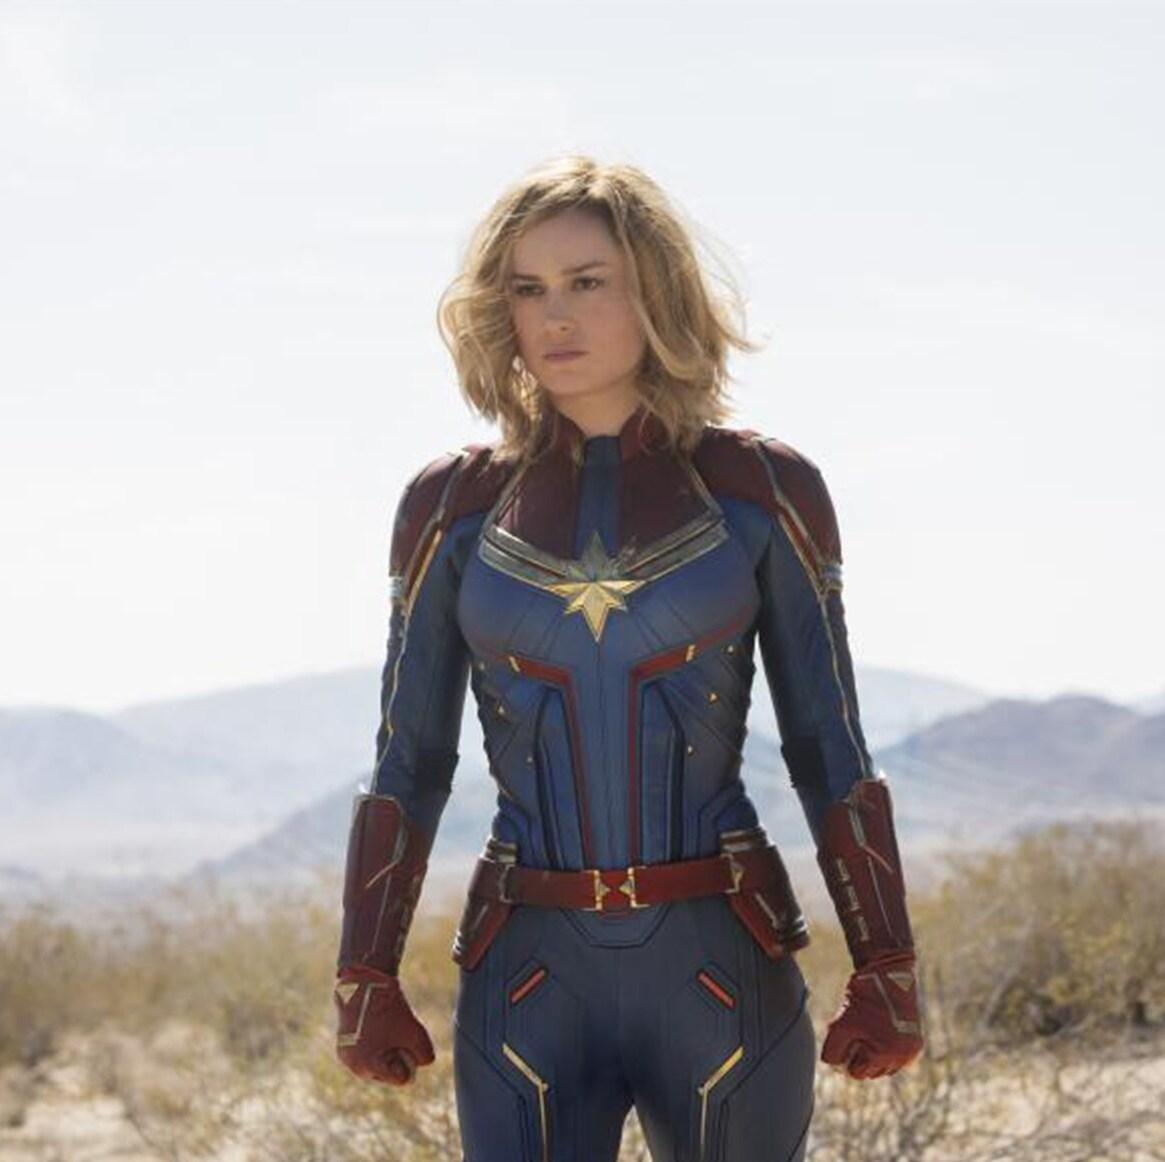 Brie Larson Didn't Feel Nervous on the Set of Captain Marvel